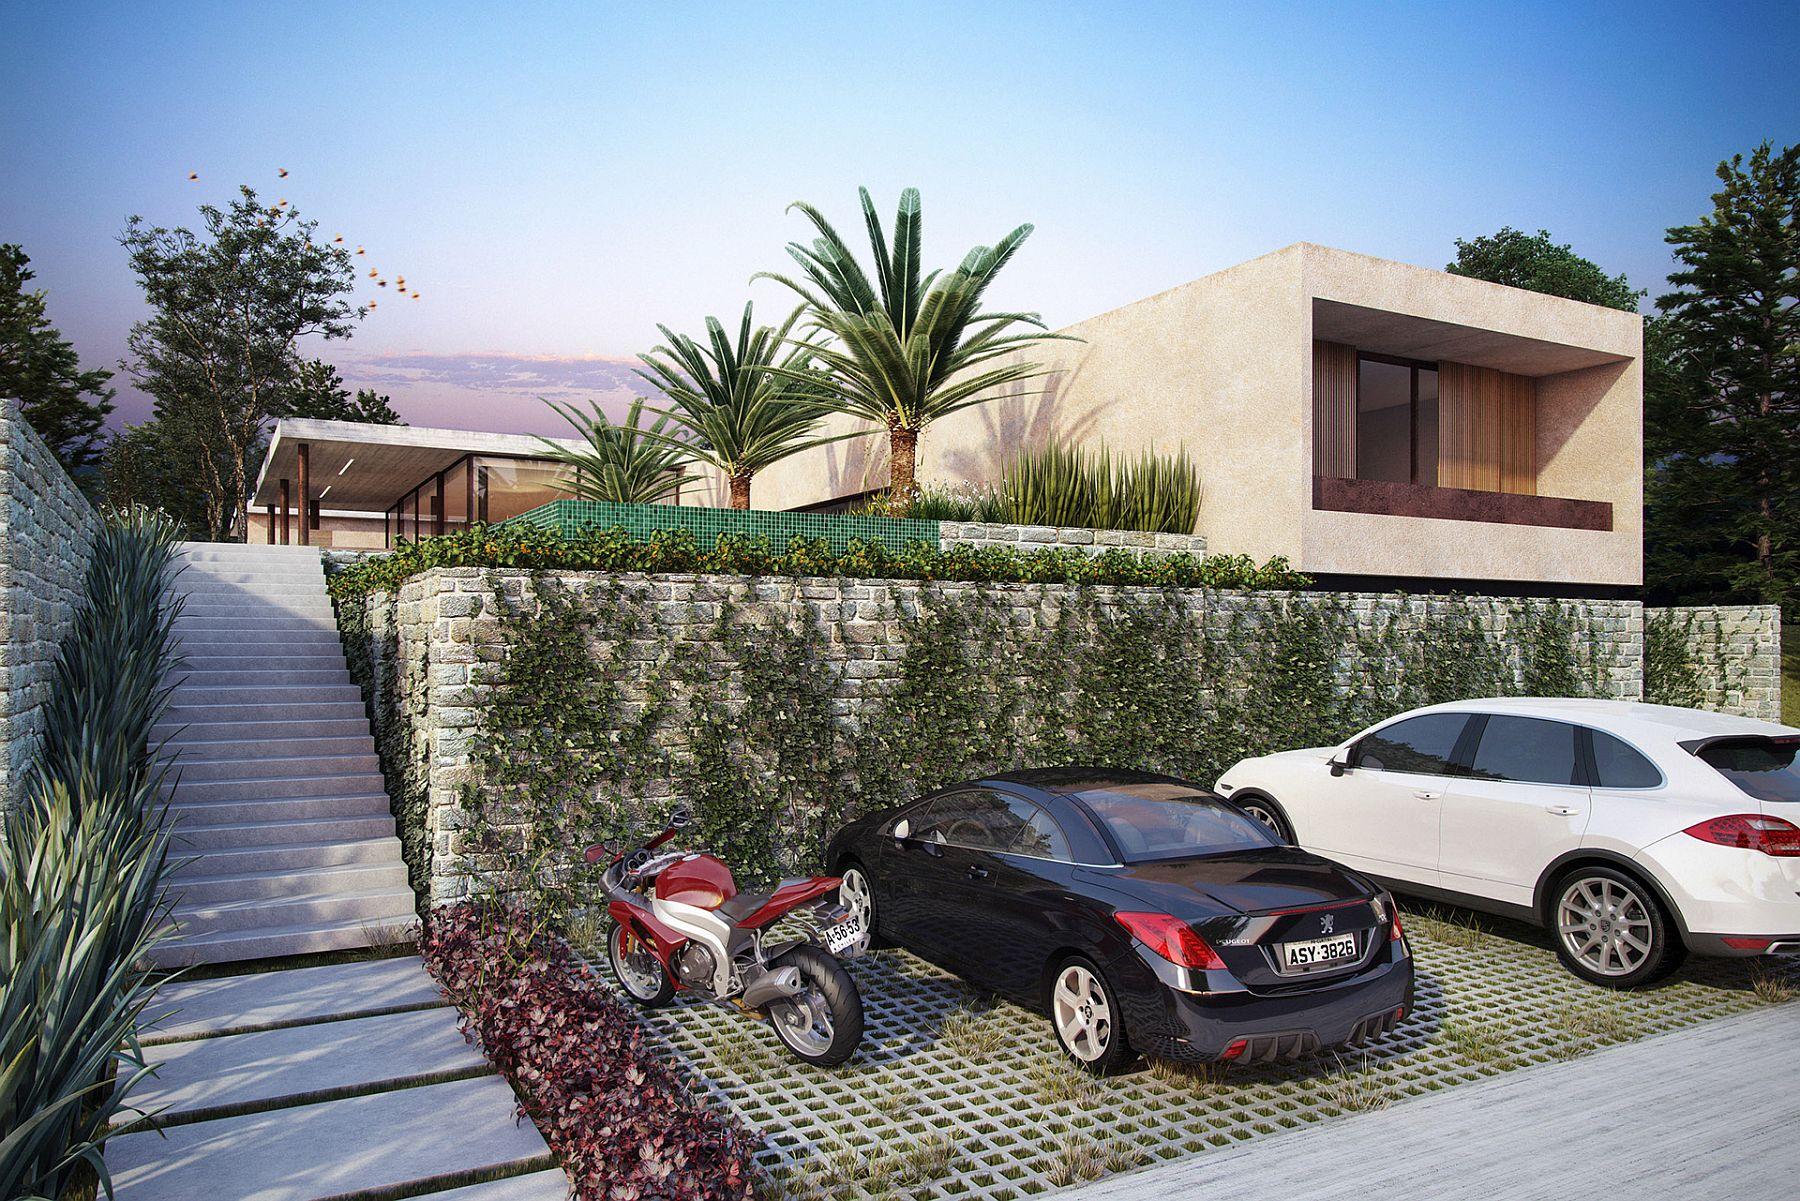 Hidden basement parking lot gives the home on uneven lot a smart, contempoarry look